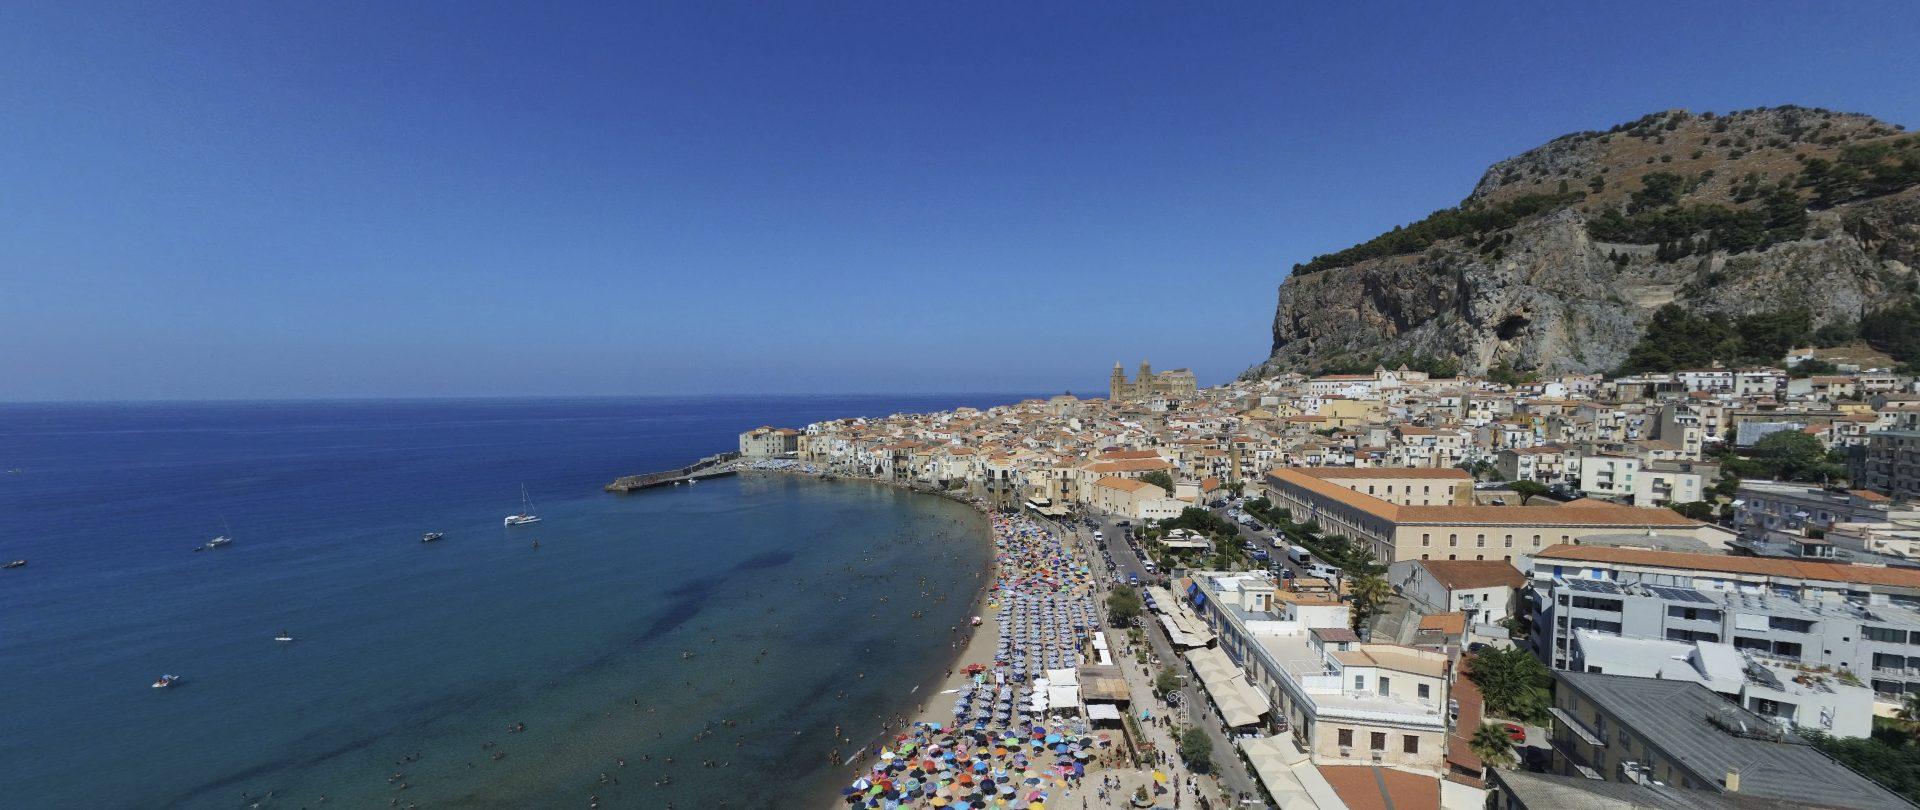 Cefalù sicilia maps 360